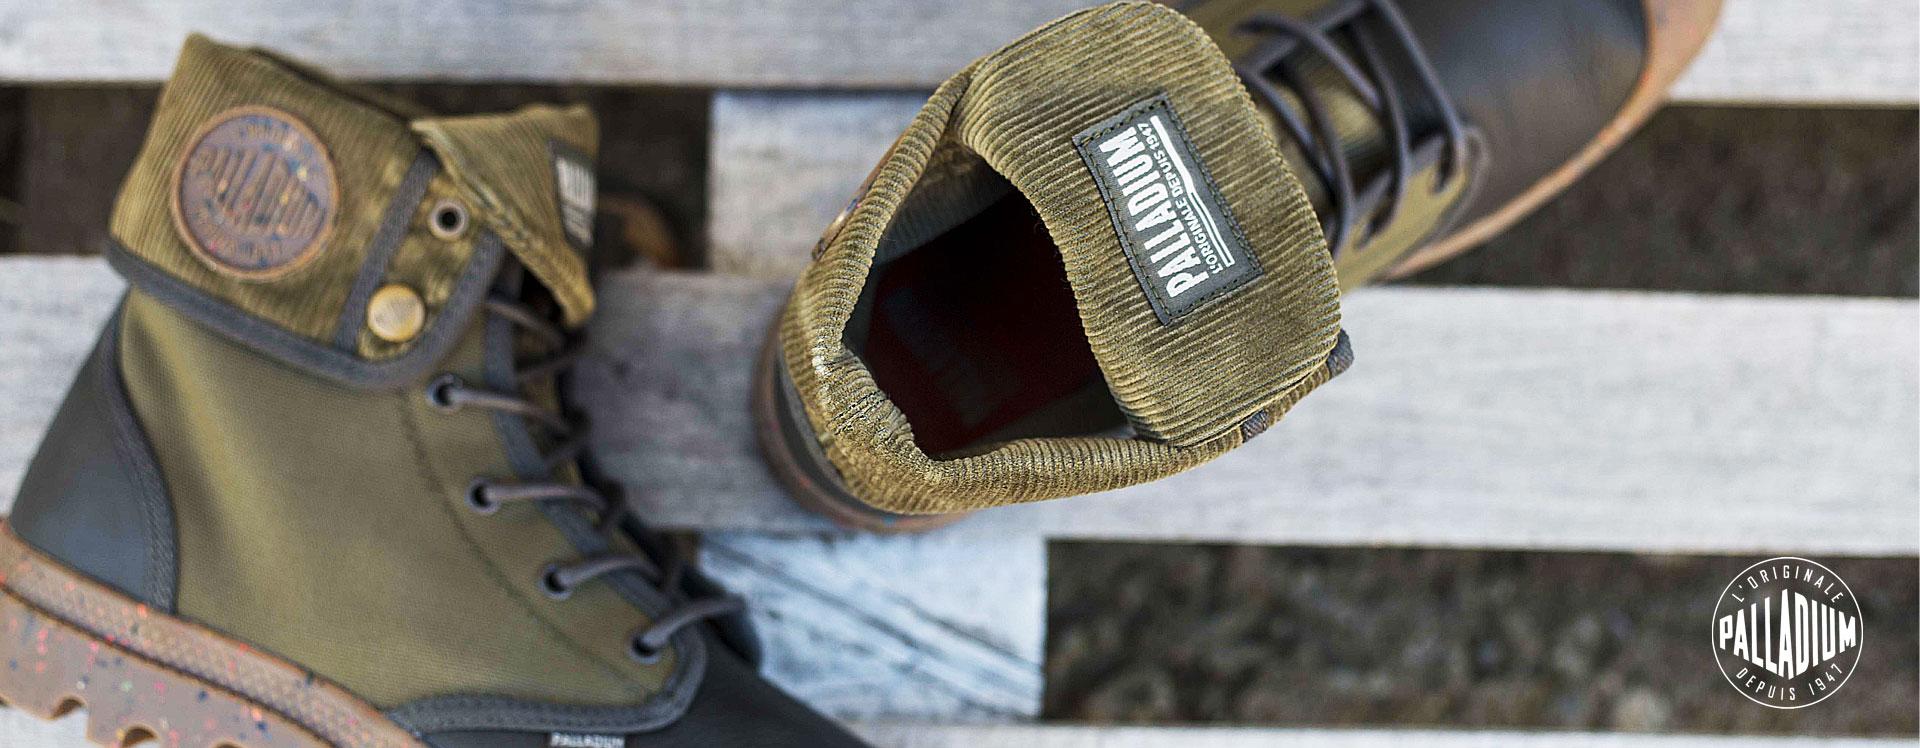 Palladium Winter Boots